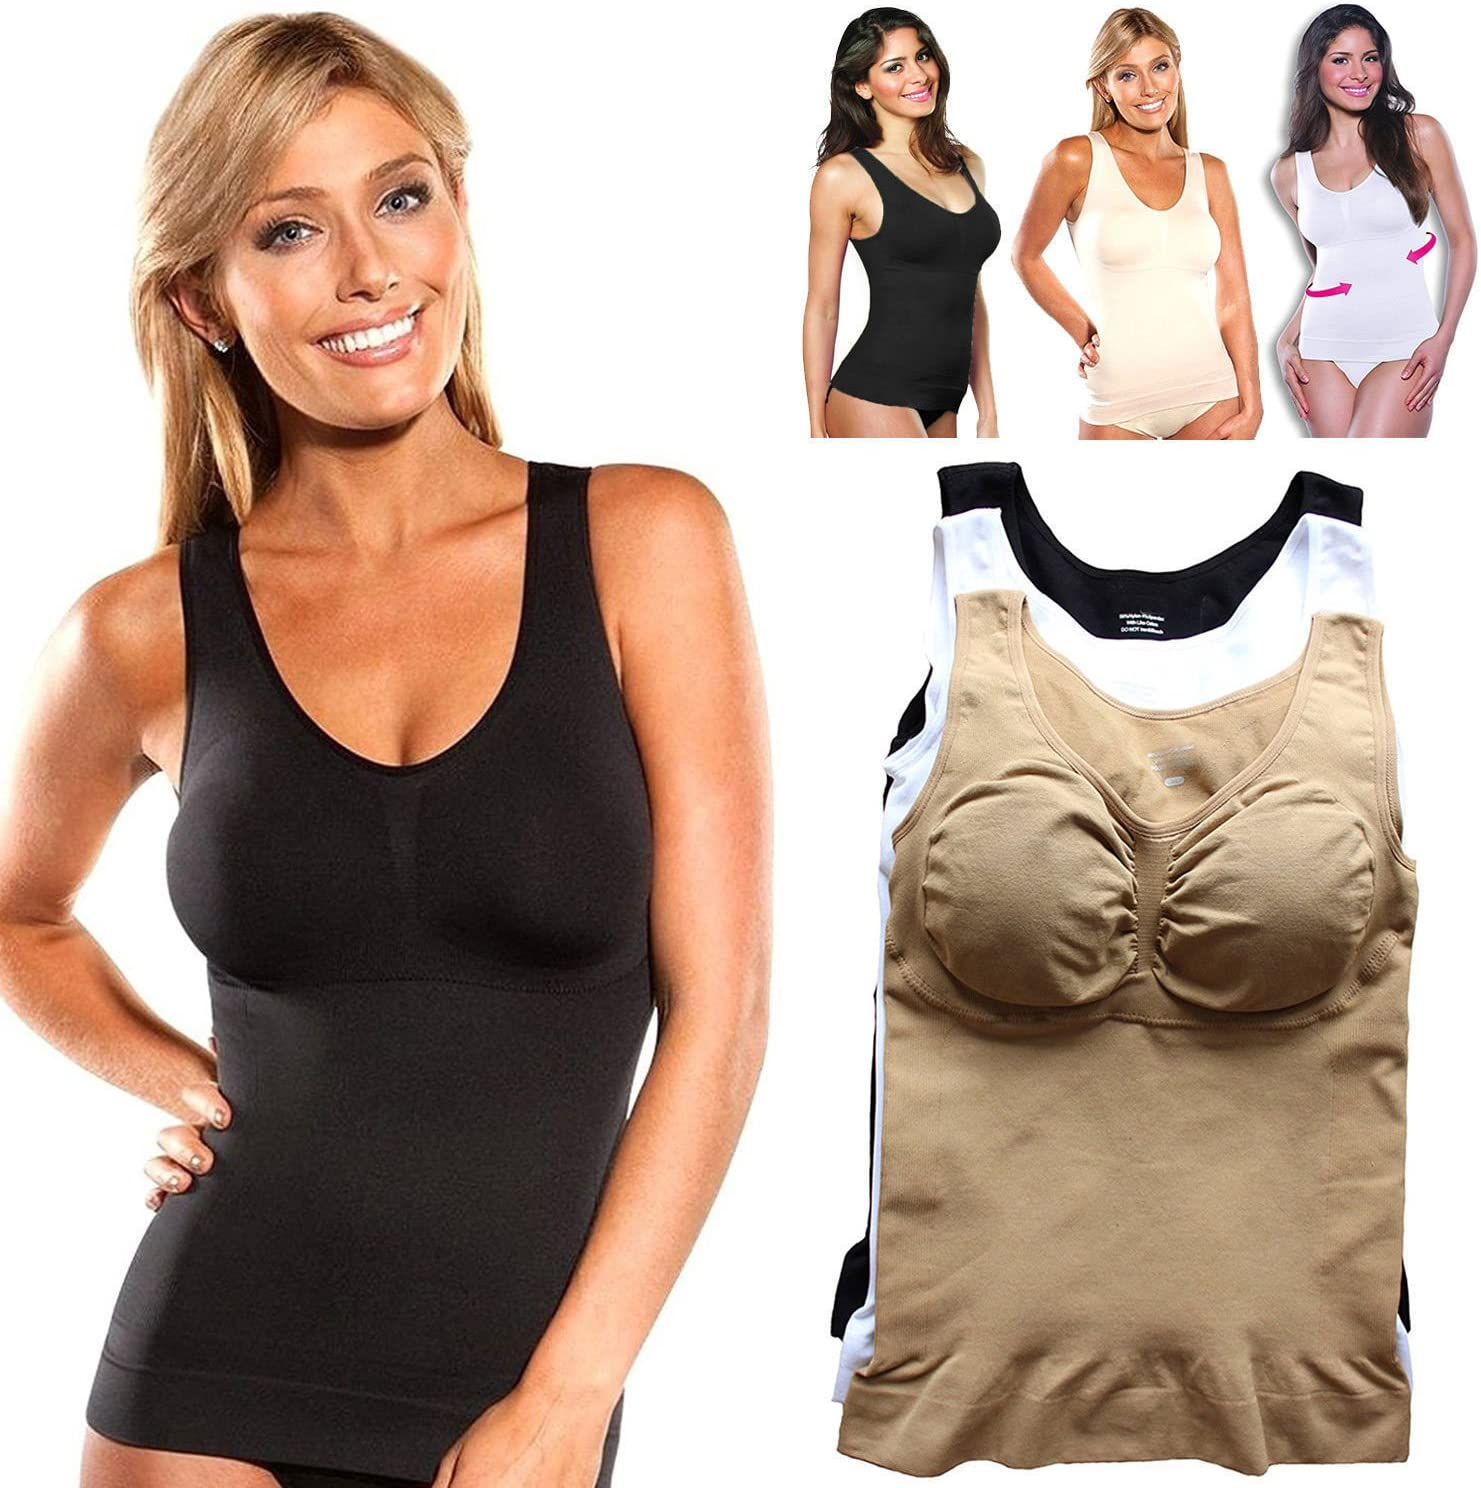 New Cami Body Shaper By Genie Bra TV ShapeWear Tank Top Slimming Camisole Shaper Large (XL, black)